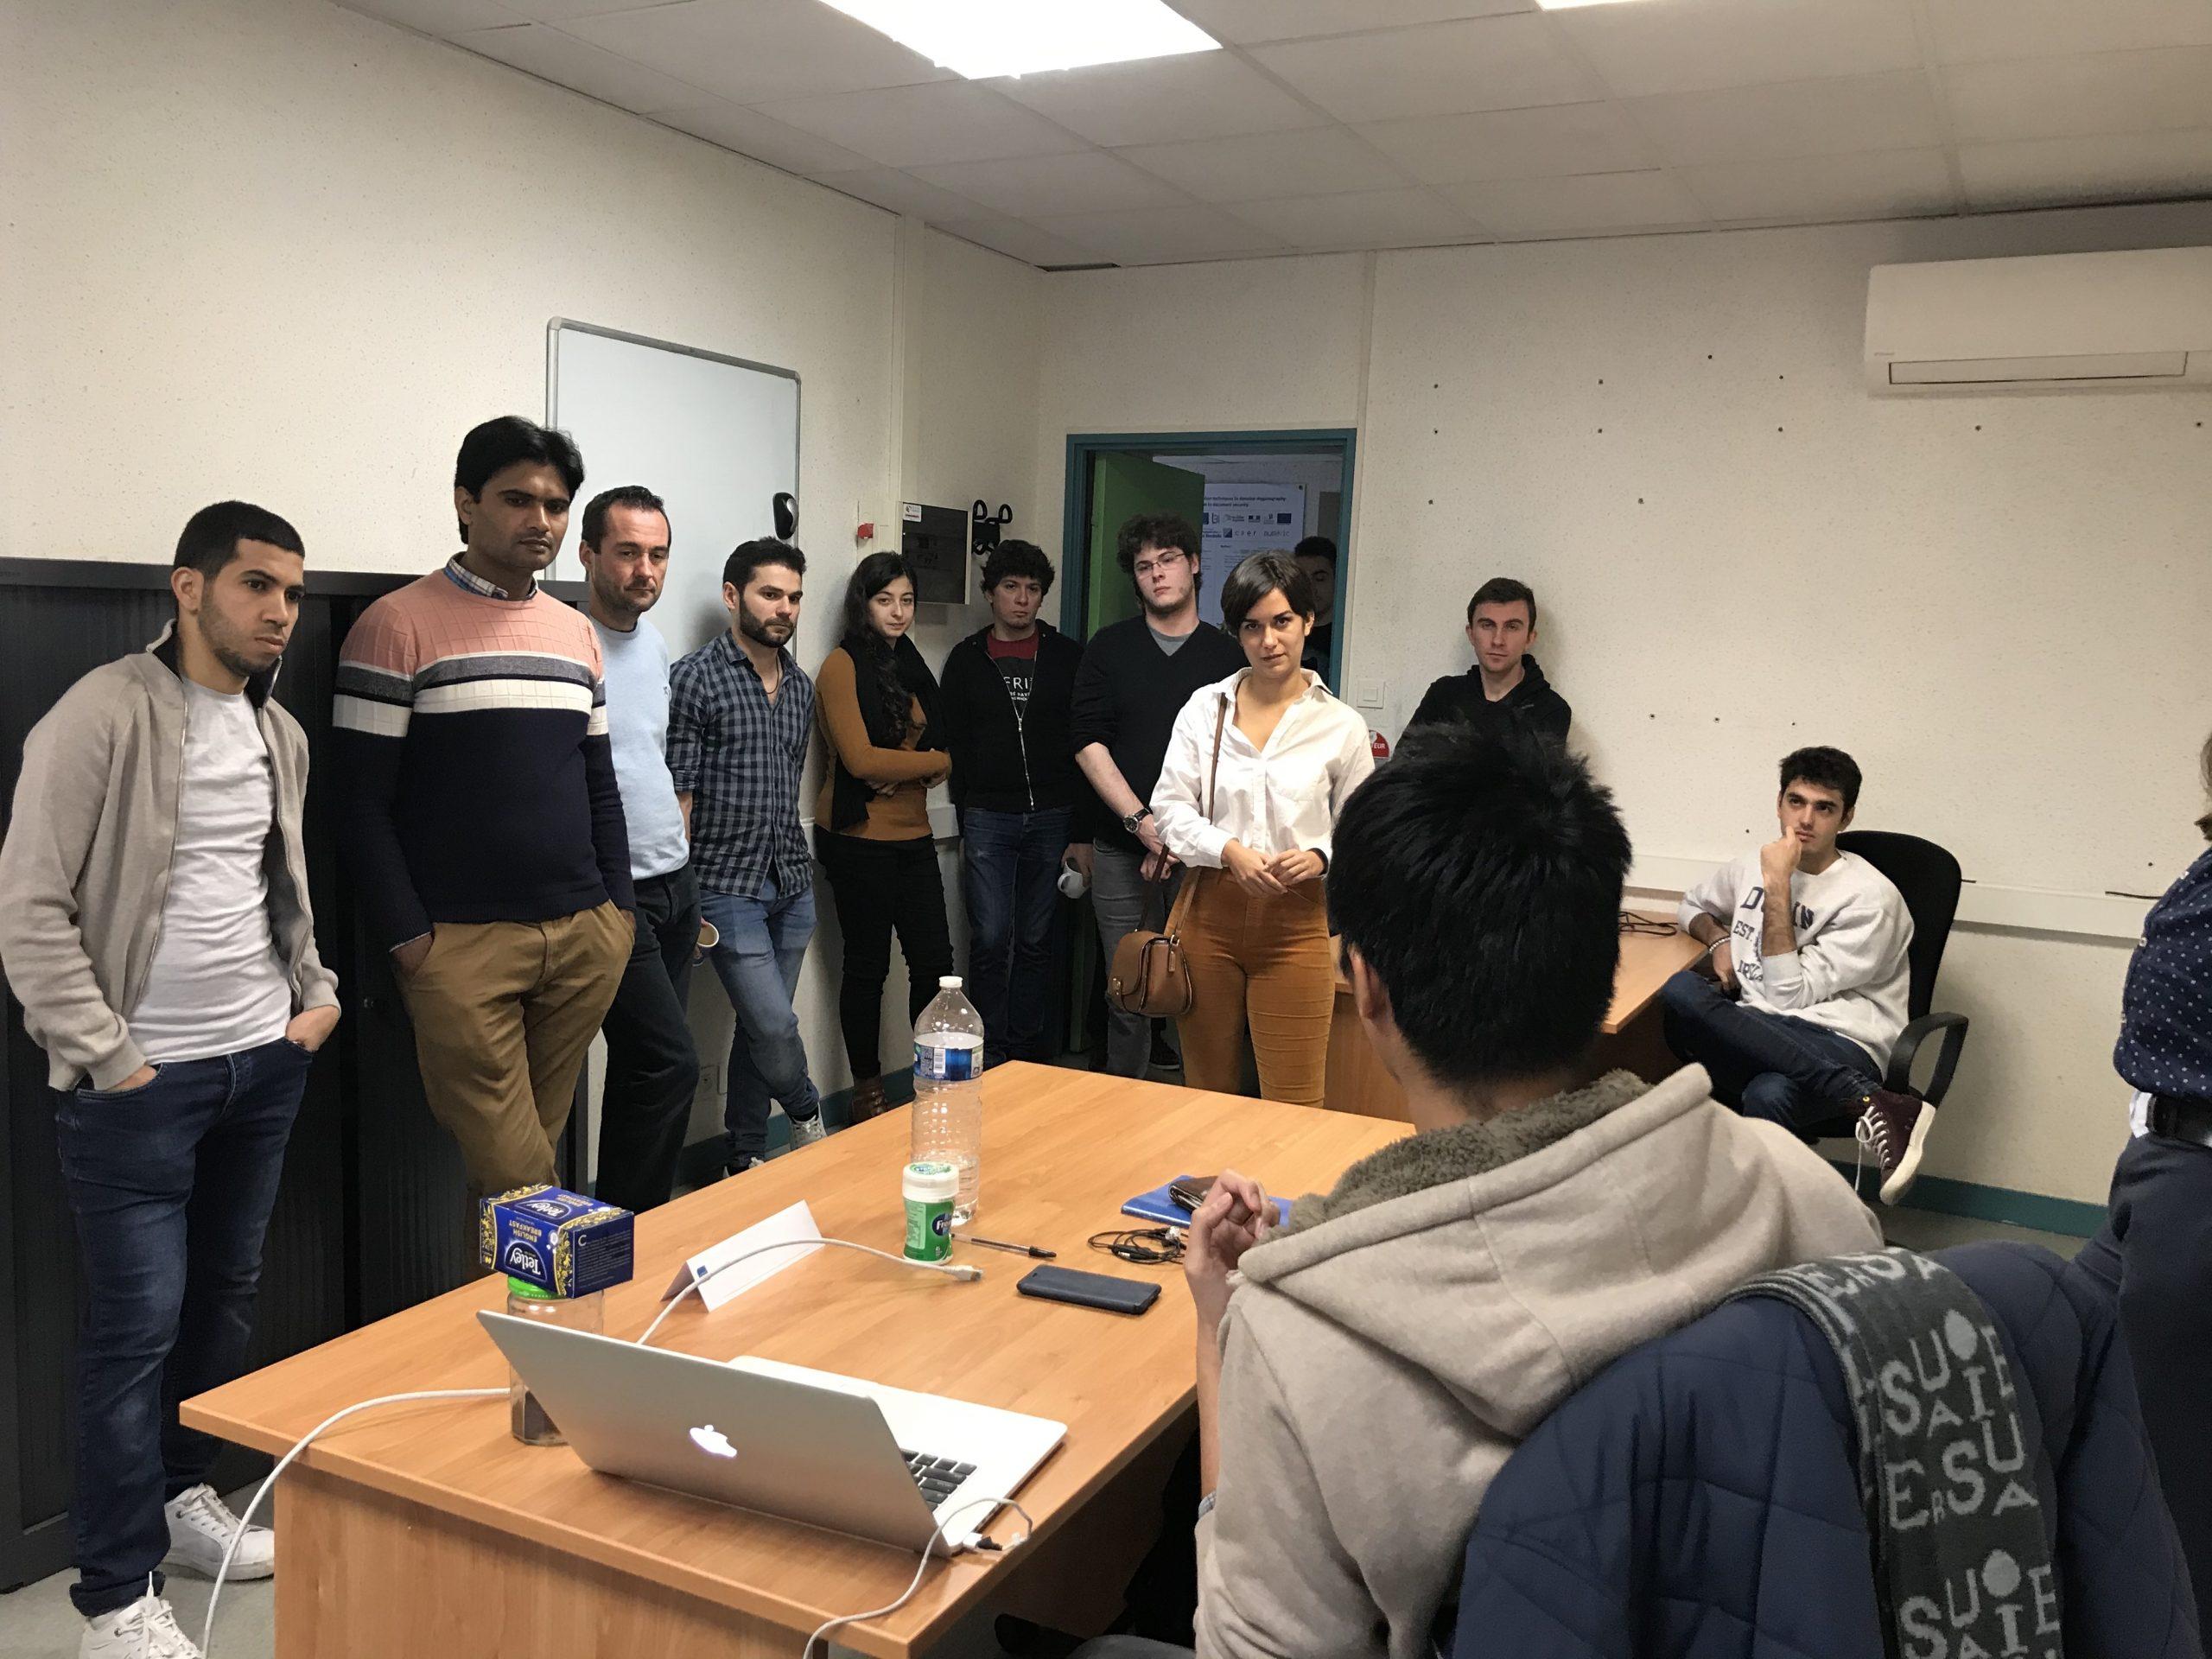 Pré-JIDAP Novembre 2019